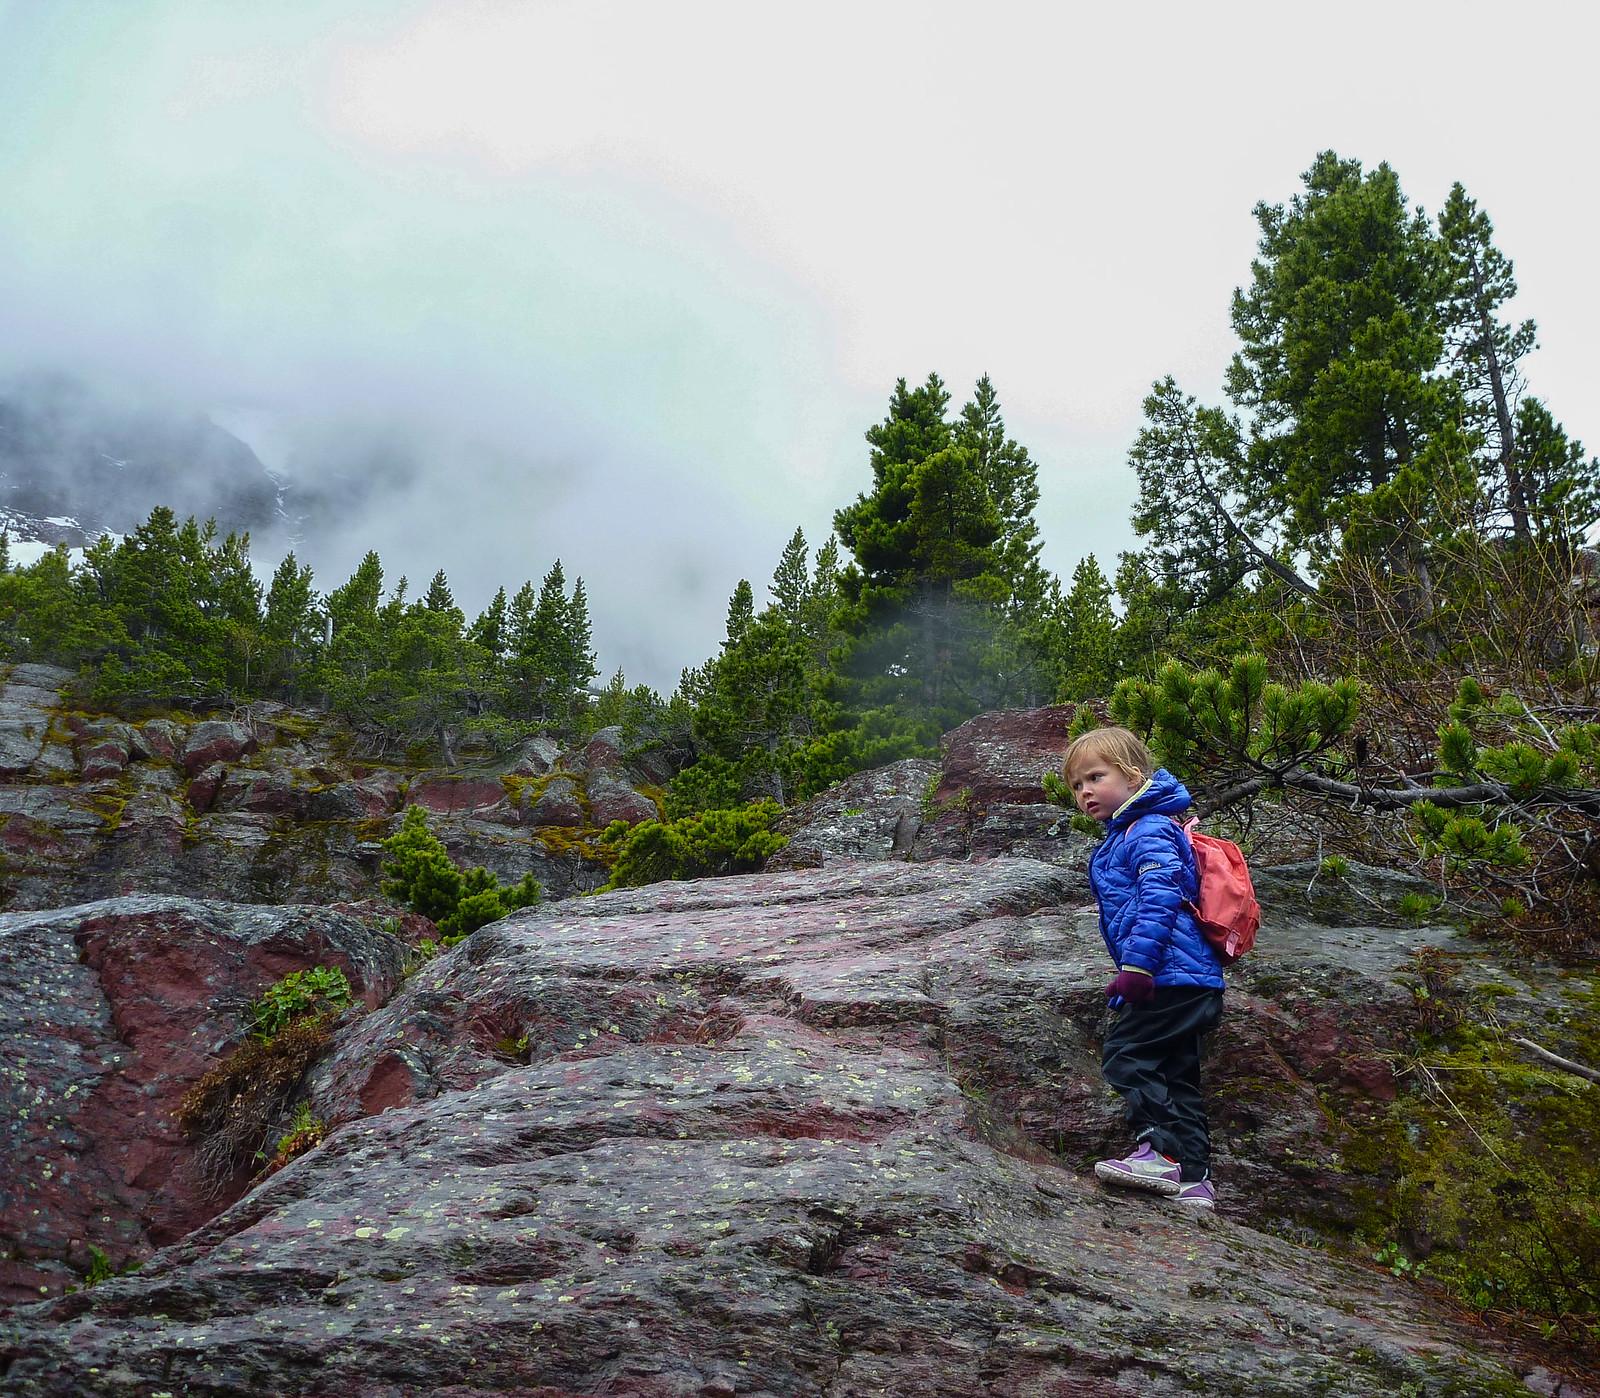 2015-05-16 Red Rock Falls -1090119.jpg